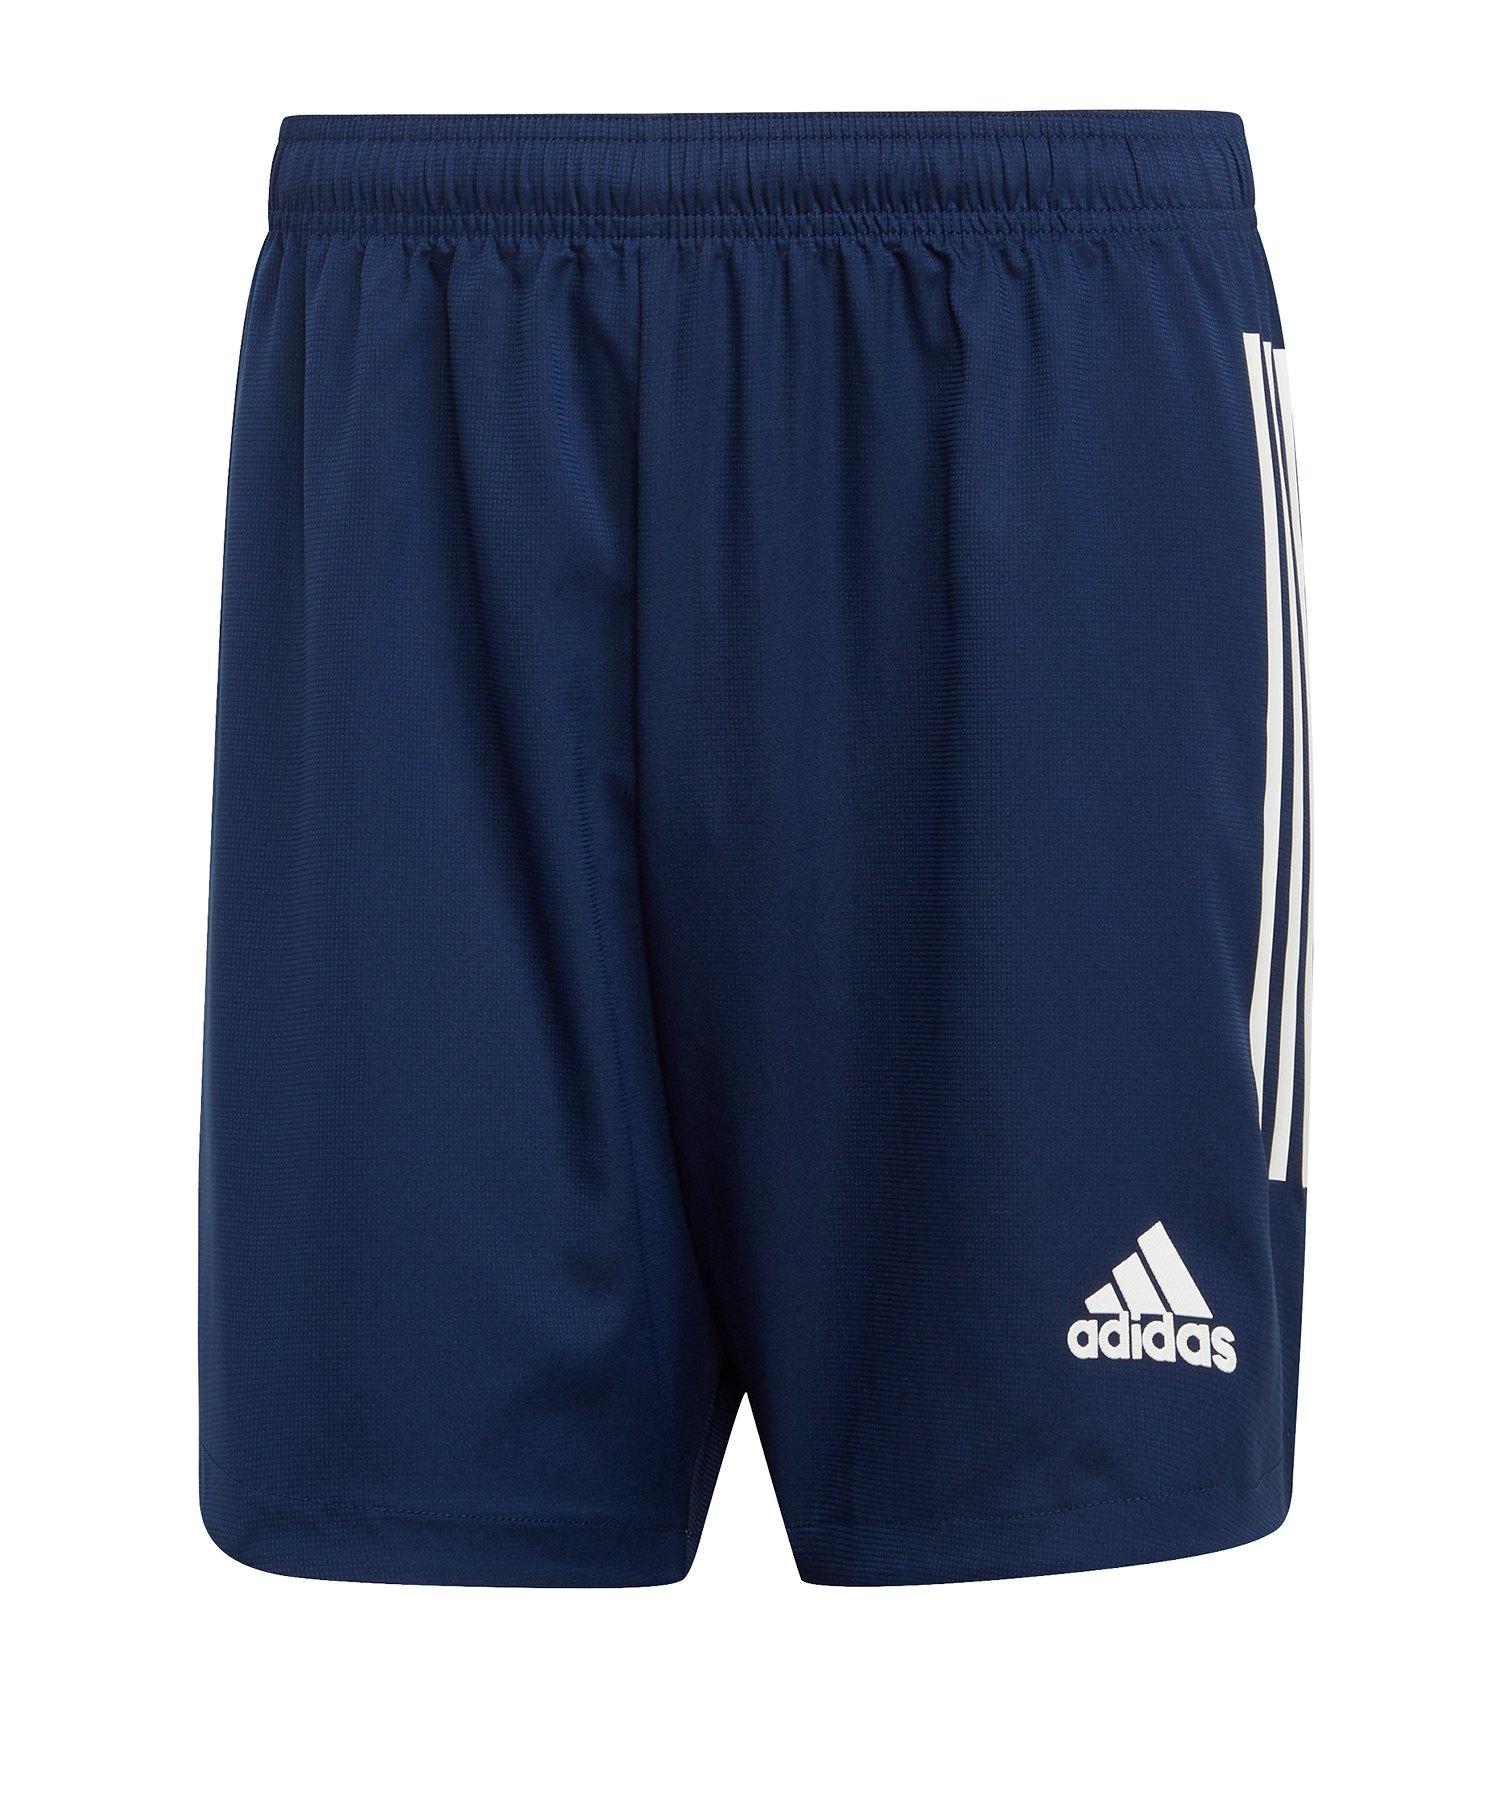 adidas Condivo 20 Short Dunkelblau Weiss - blau